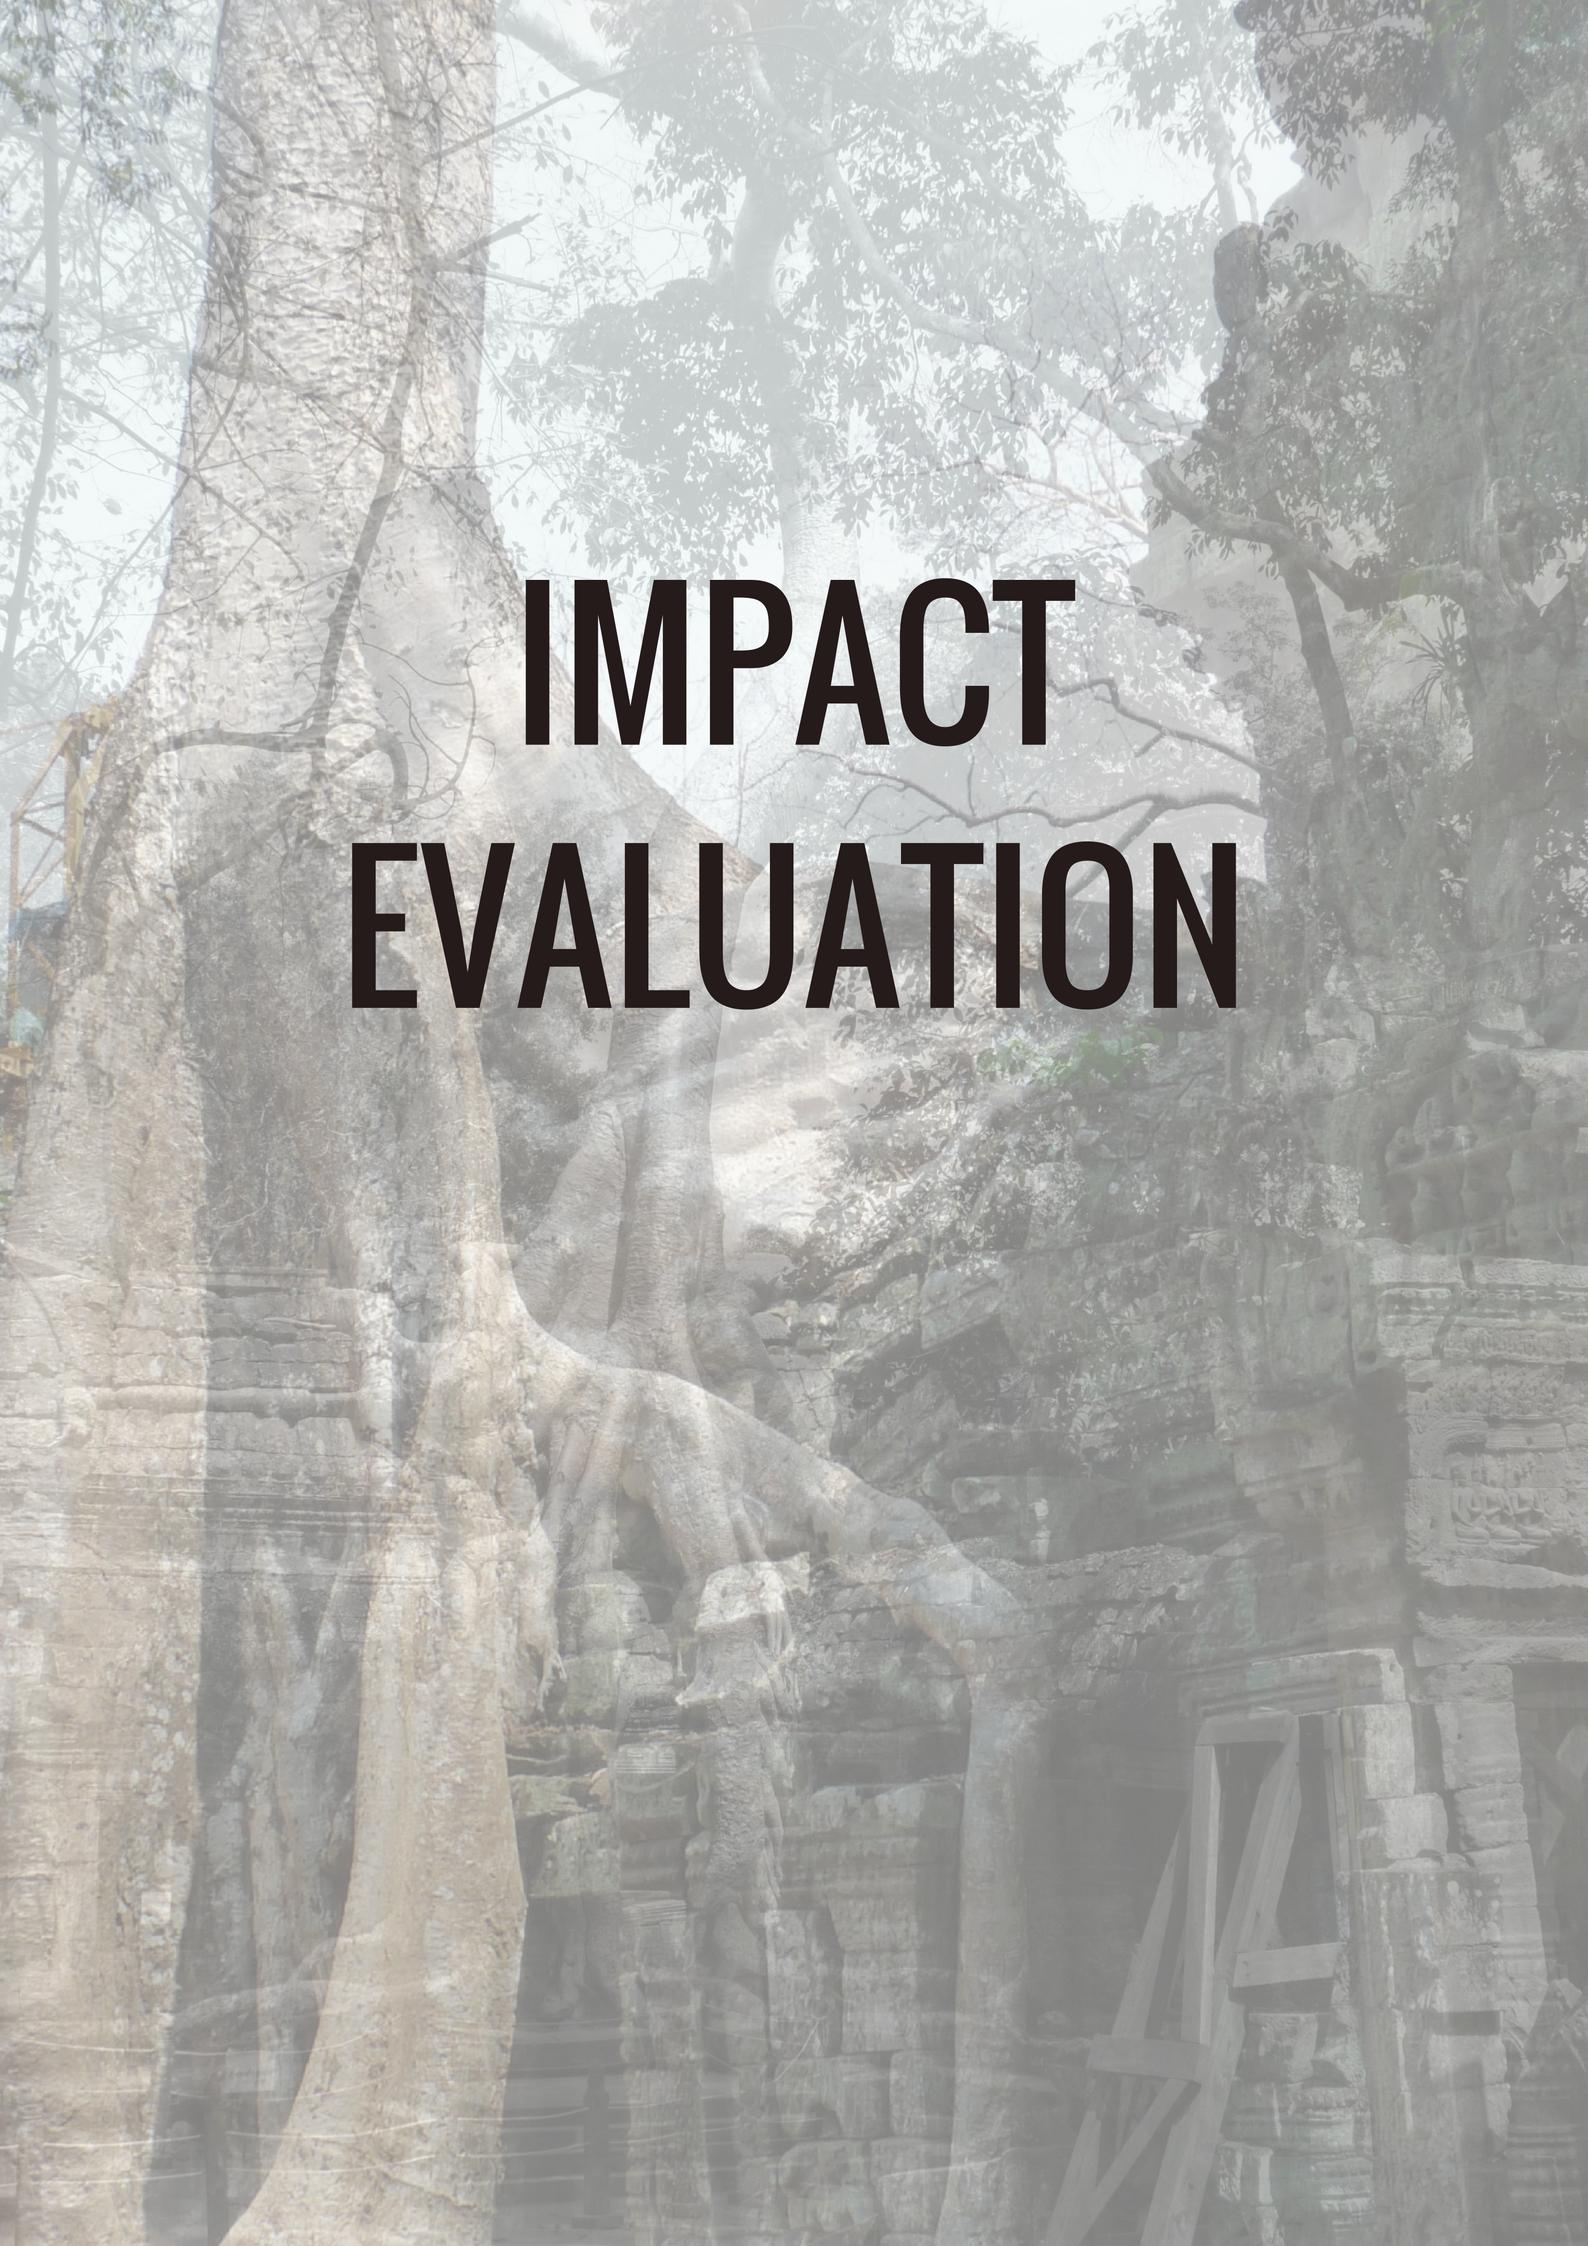 impact evaluation